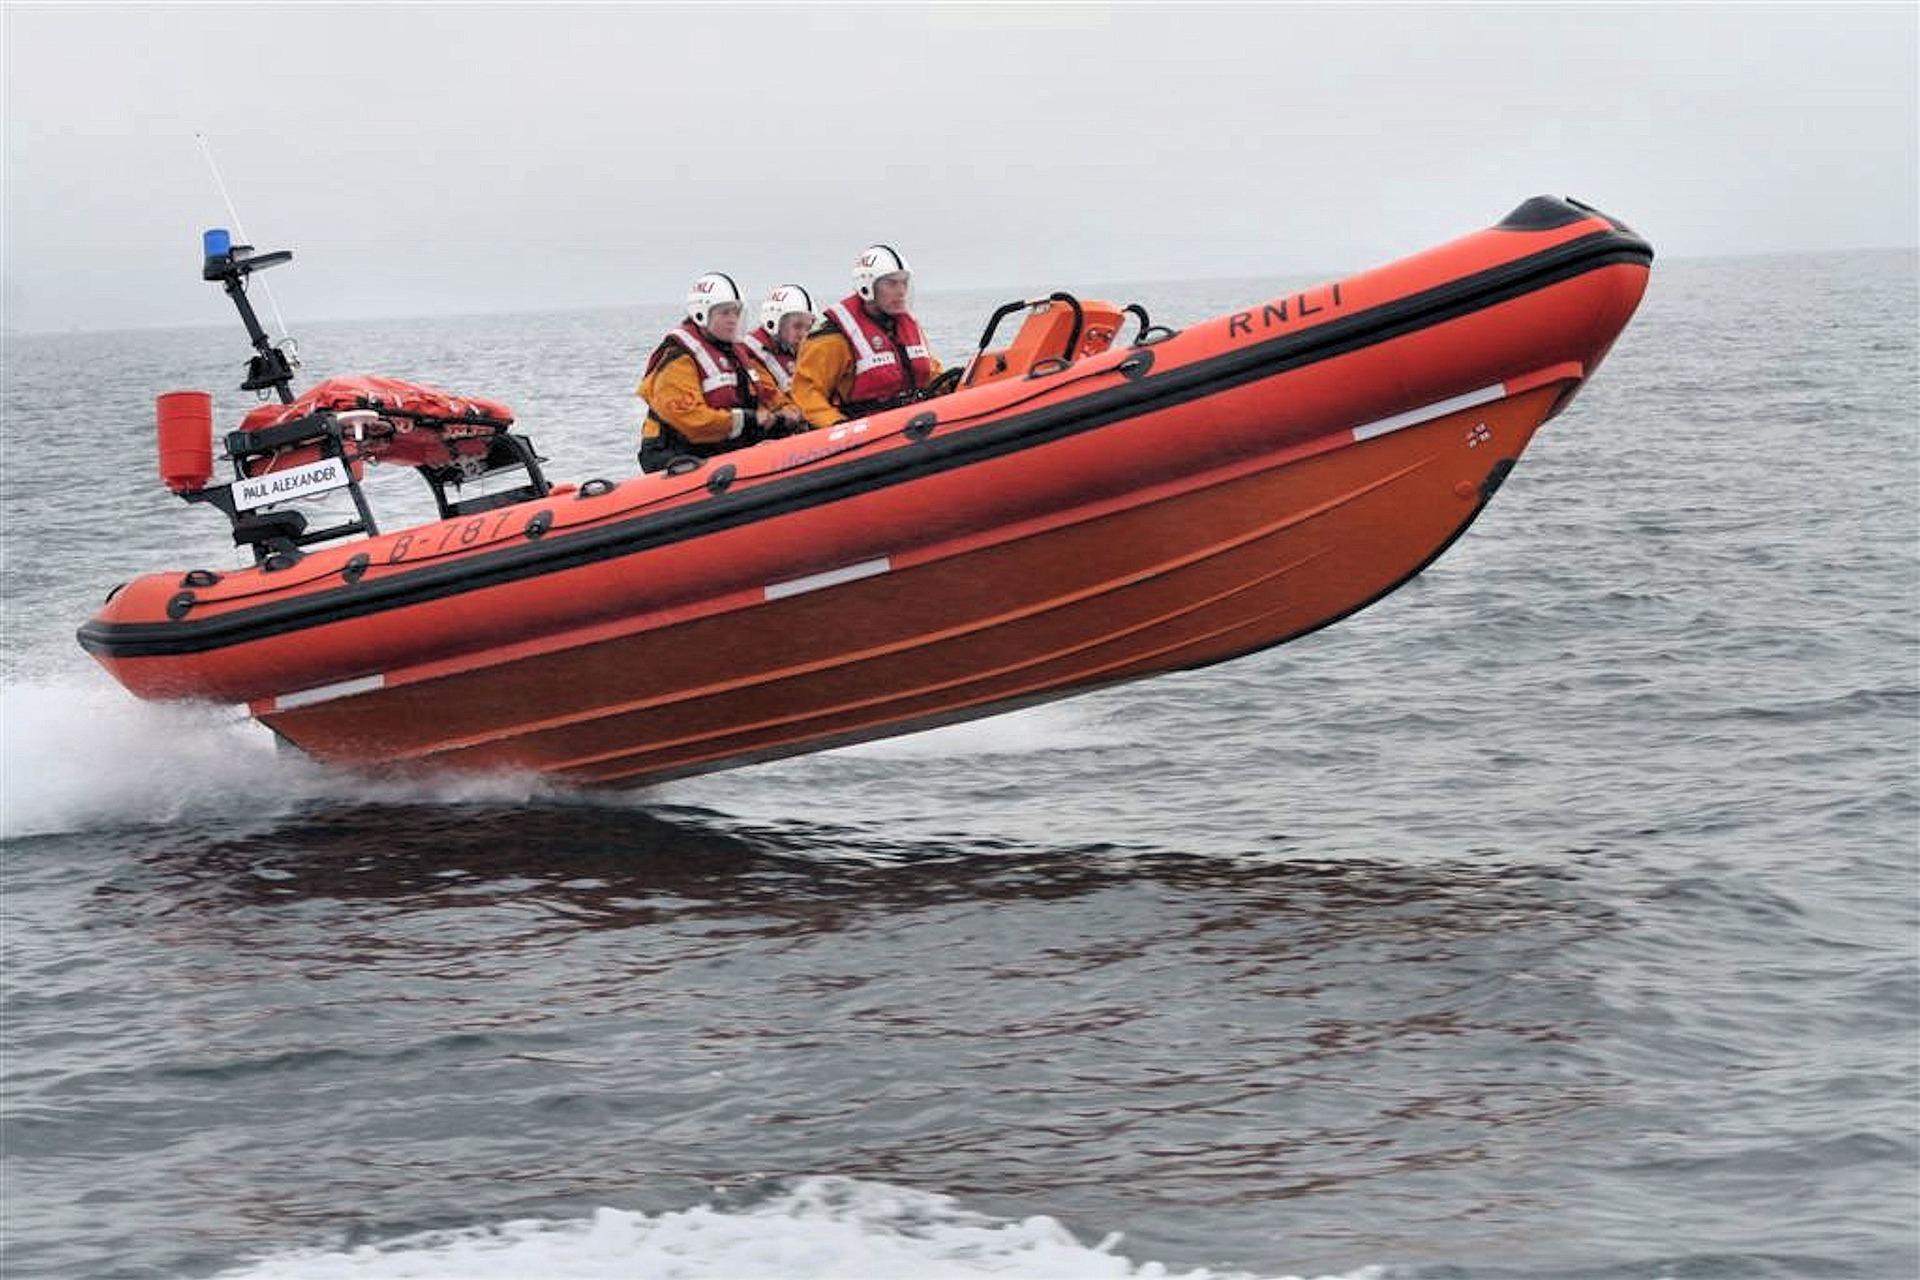 The coastguard has been sent to assist